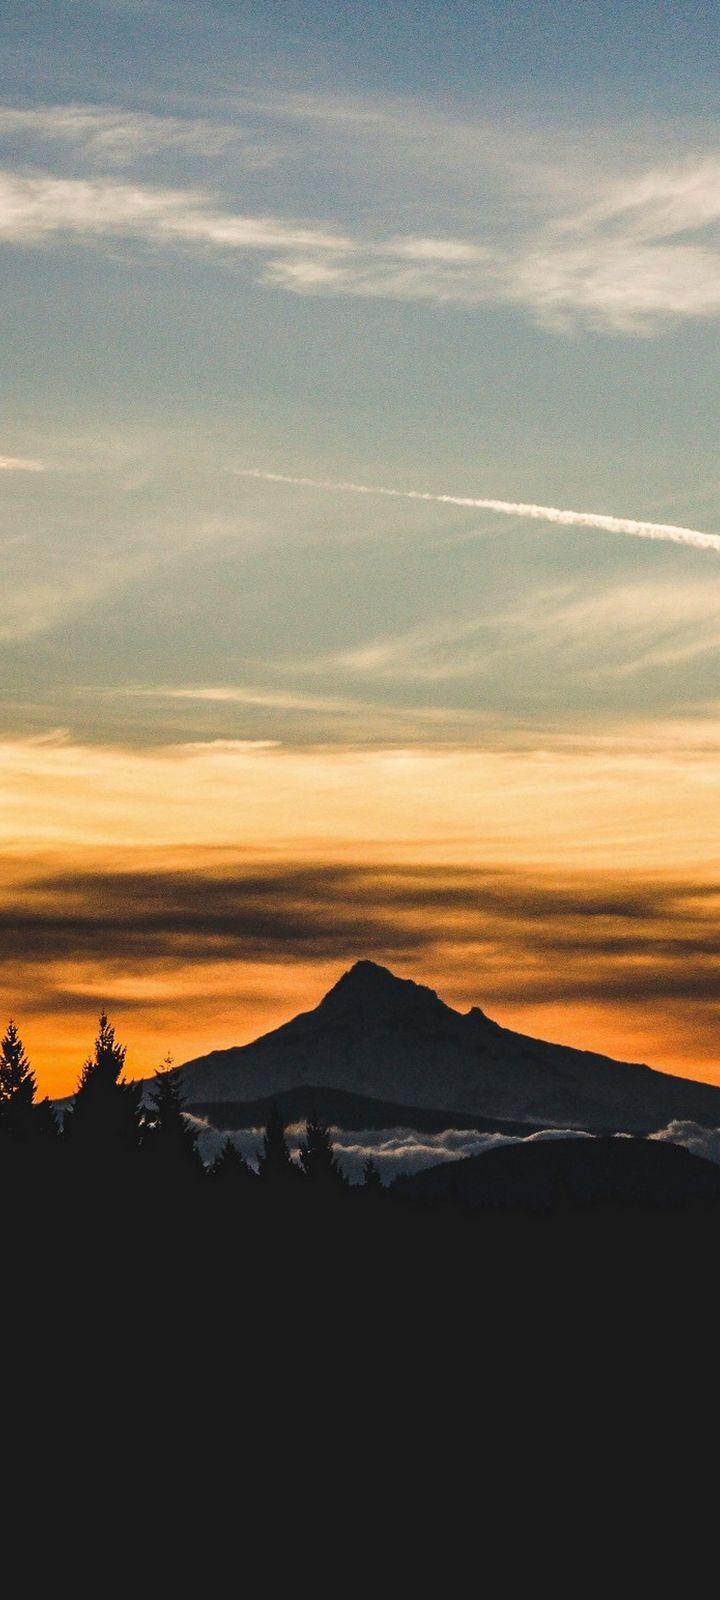 Mountain Sunset Sky Nature Wallpaper - [720x1600]